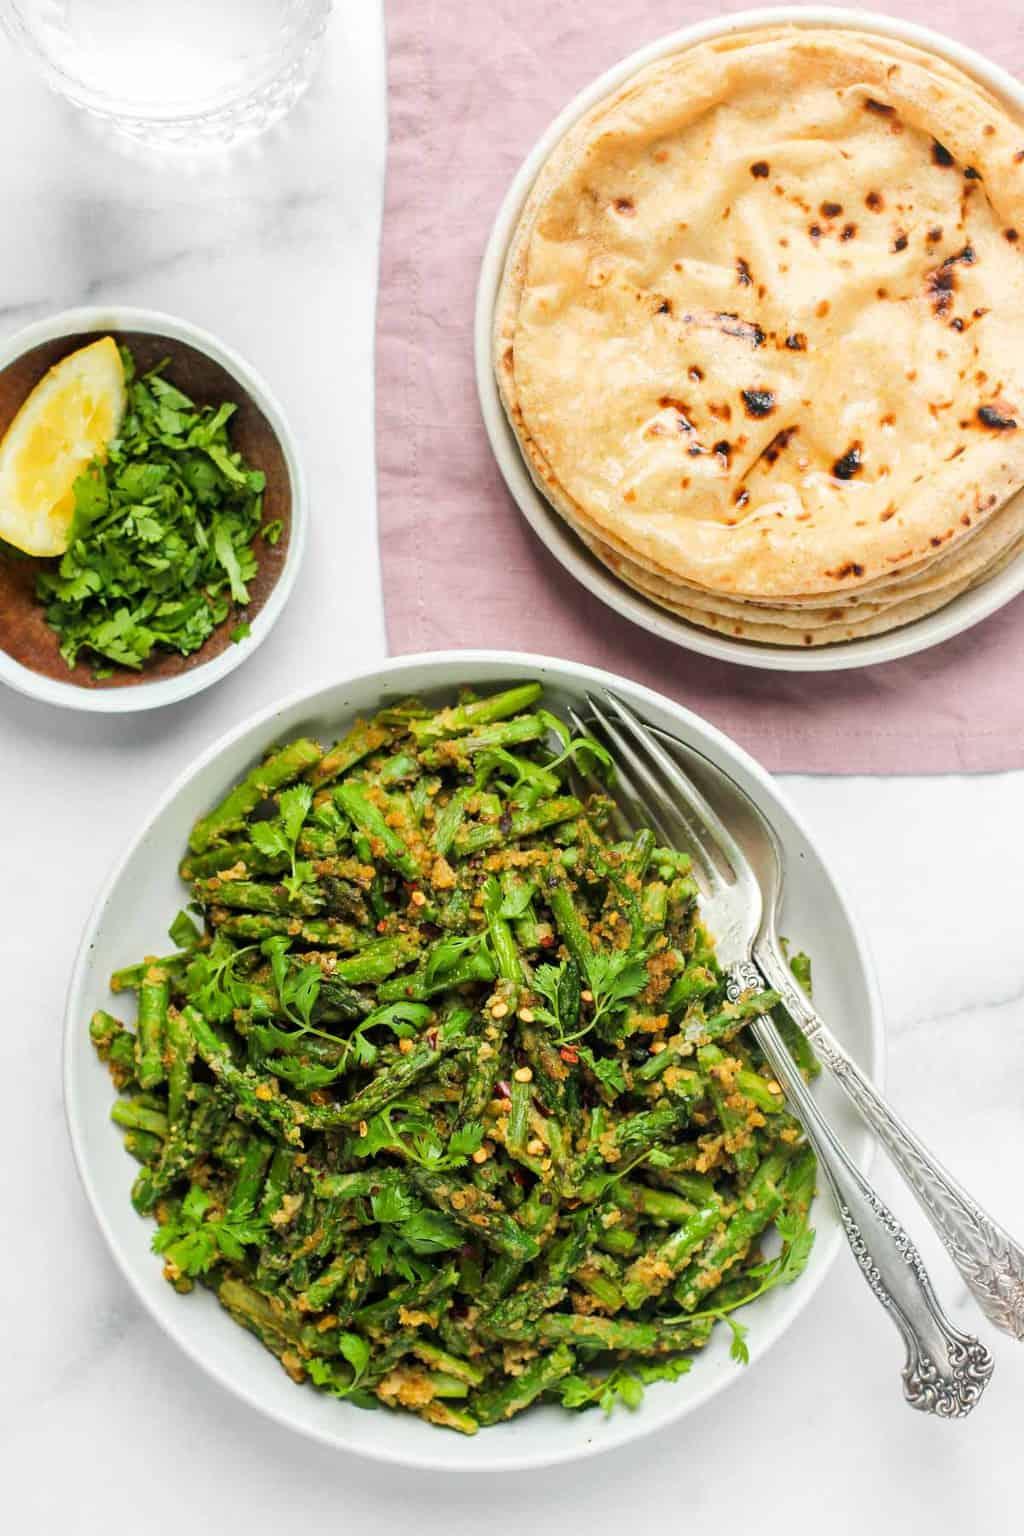 asparagus stir fry with roti